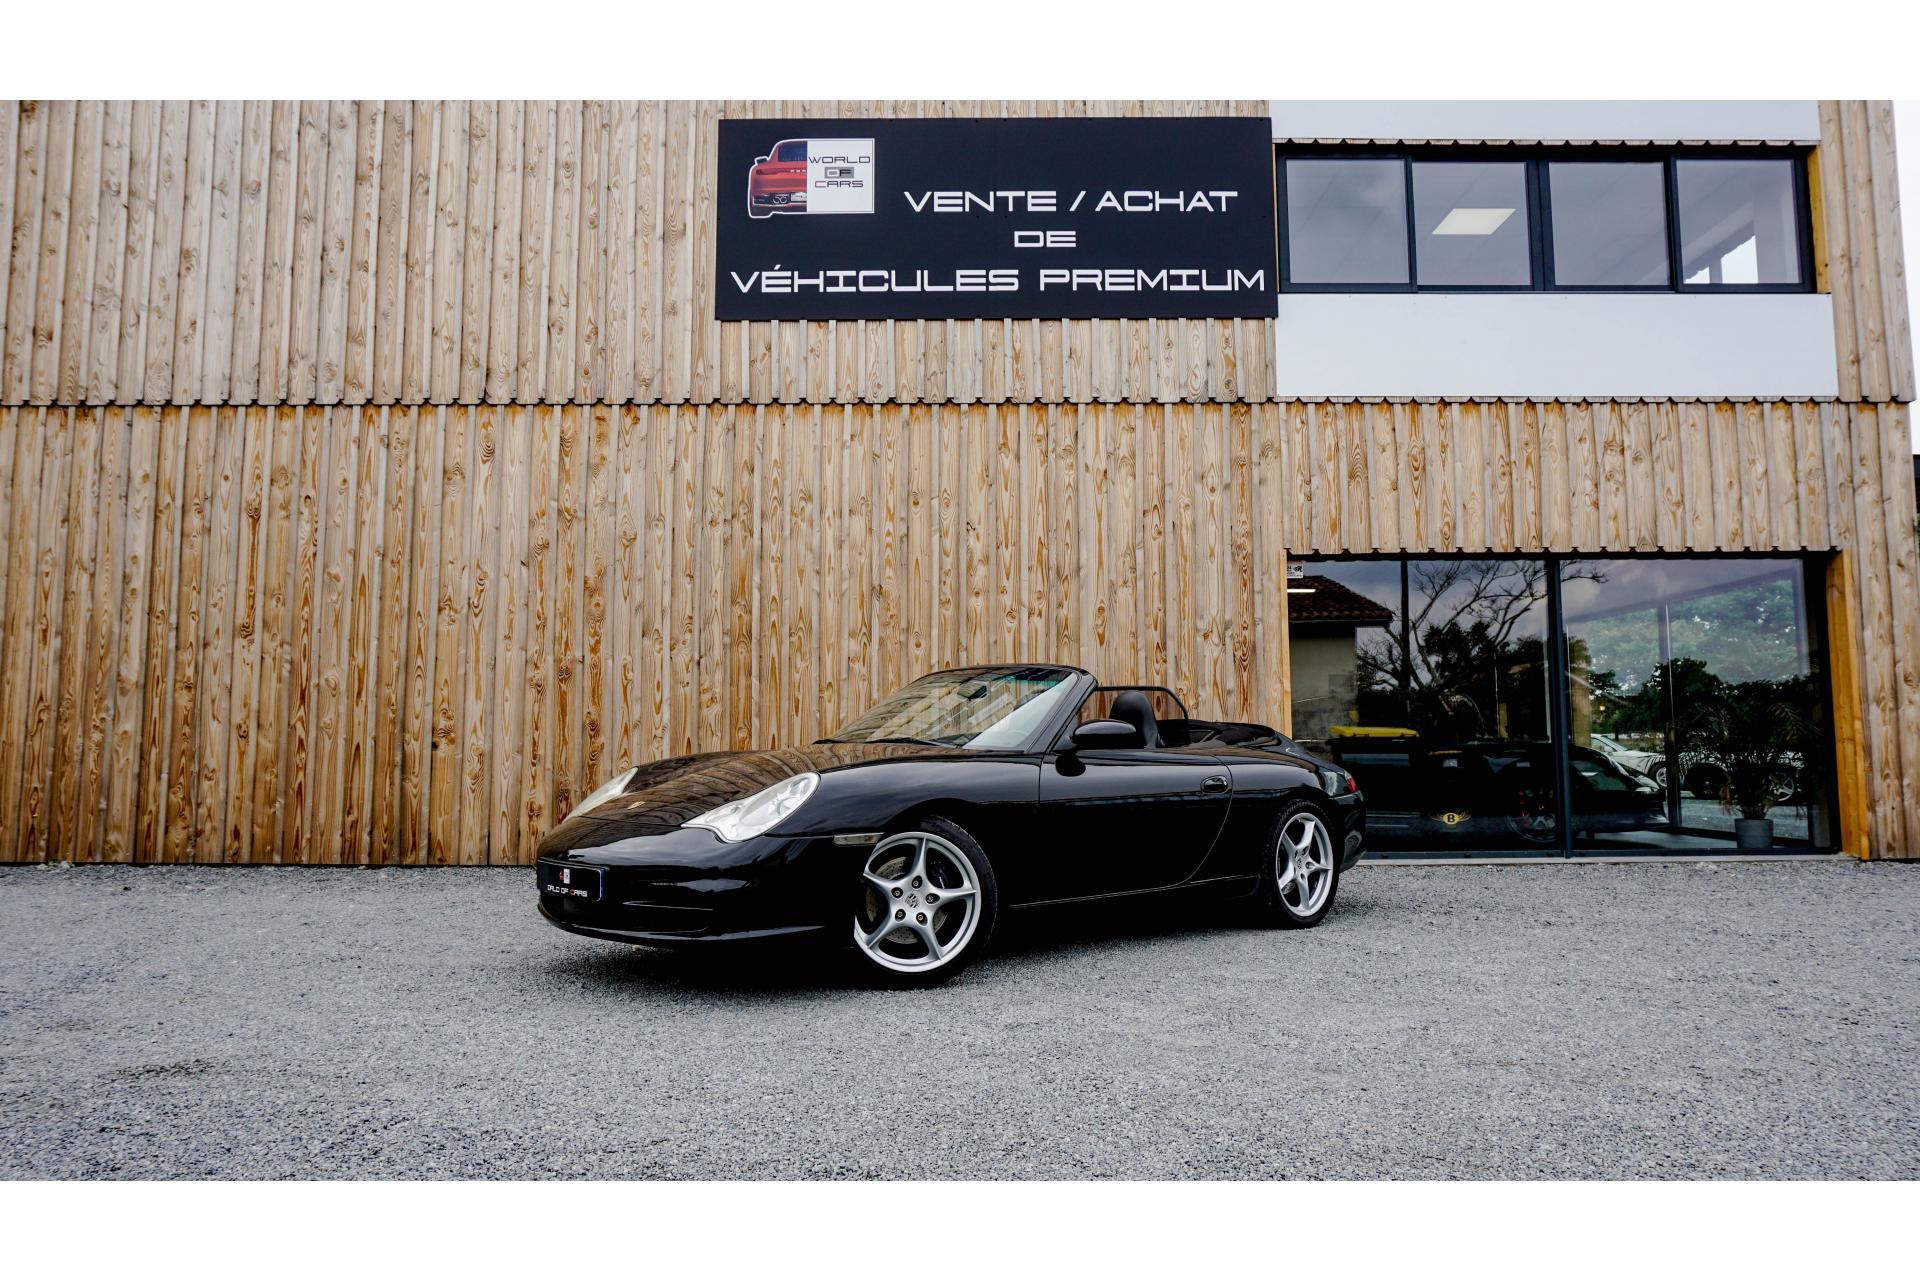 PORSCHE-911- Cabriolet 3.6i  TYPE 996 CABRIOLET Carrera